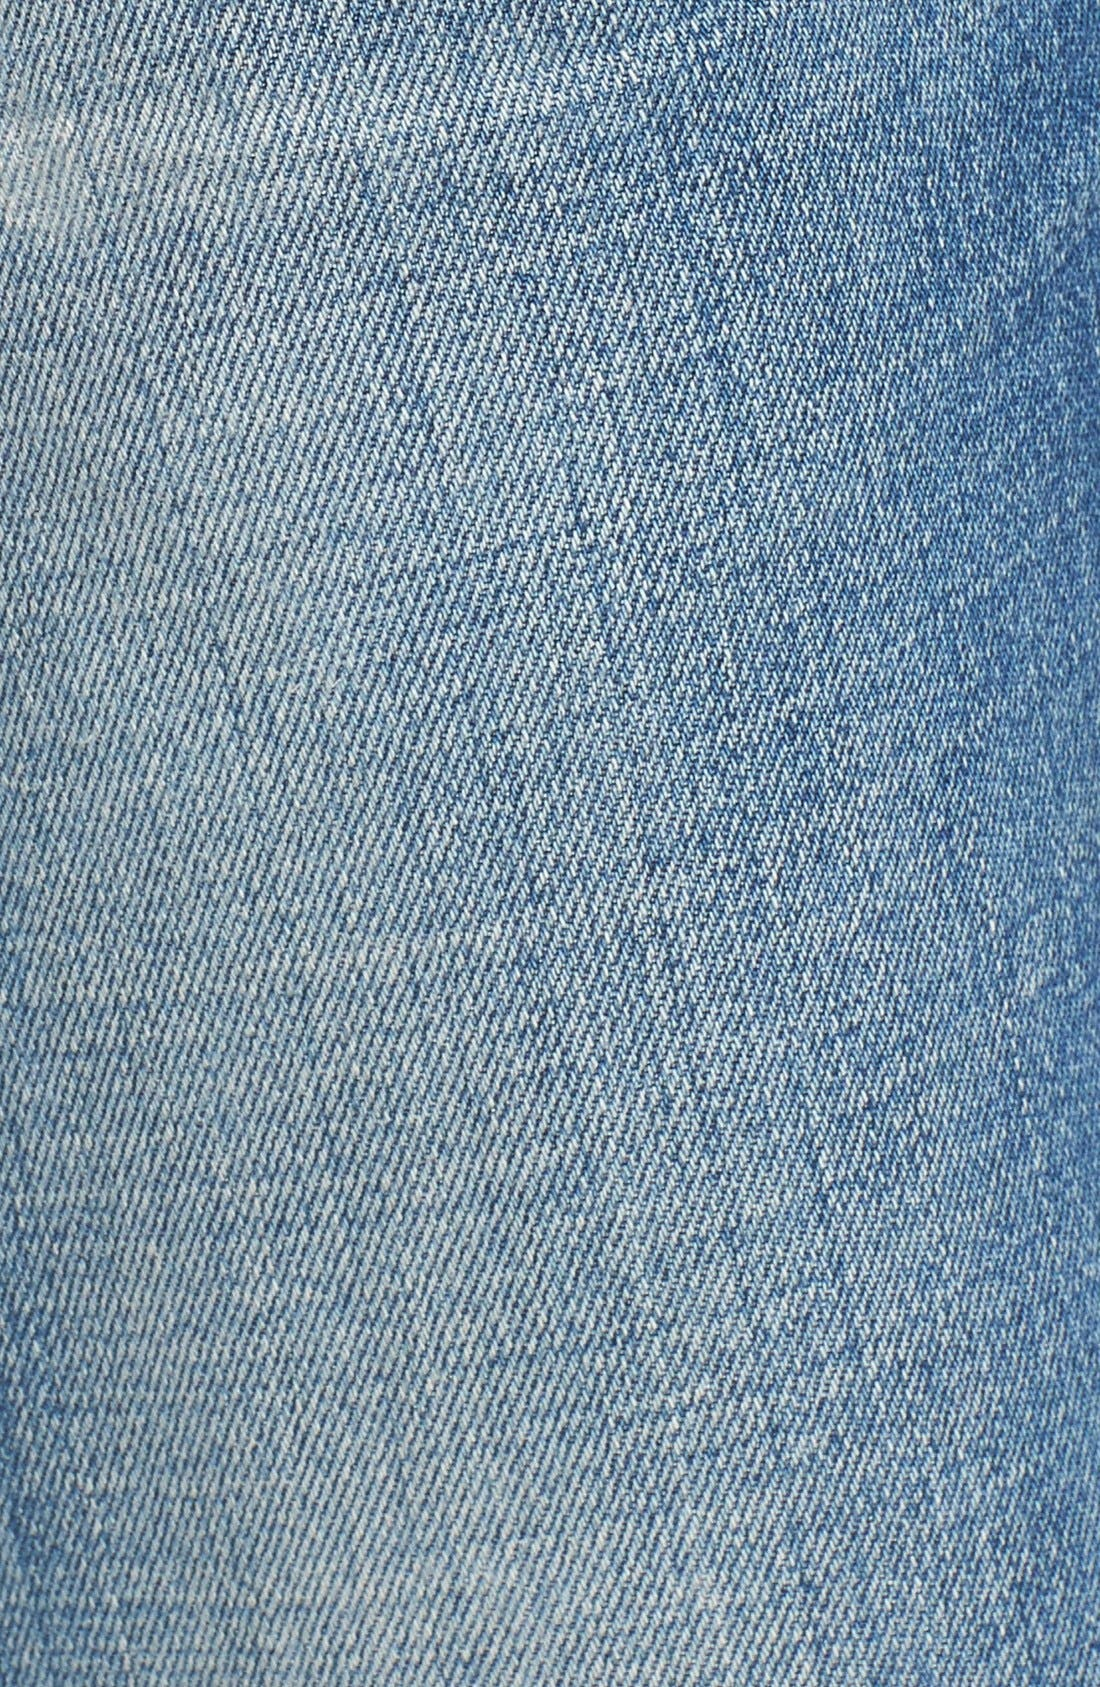 Liya High Waist Slim Boyfriend Jeans,                             Alternate thumbnail 5, color,                             426